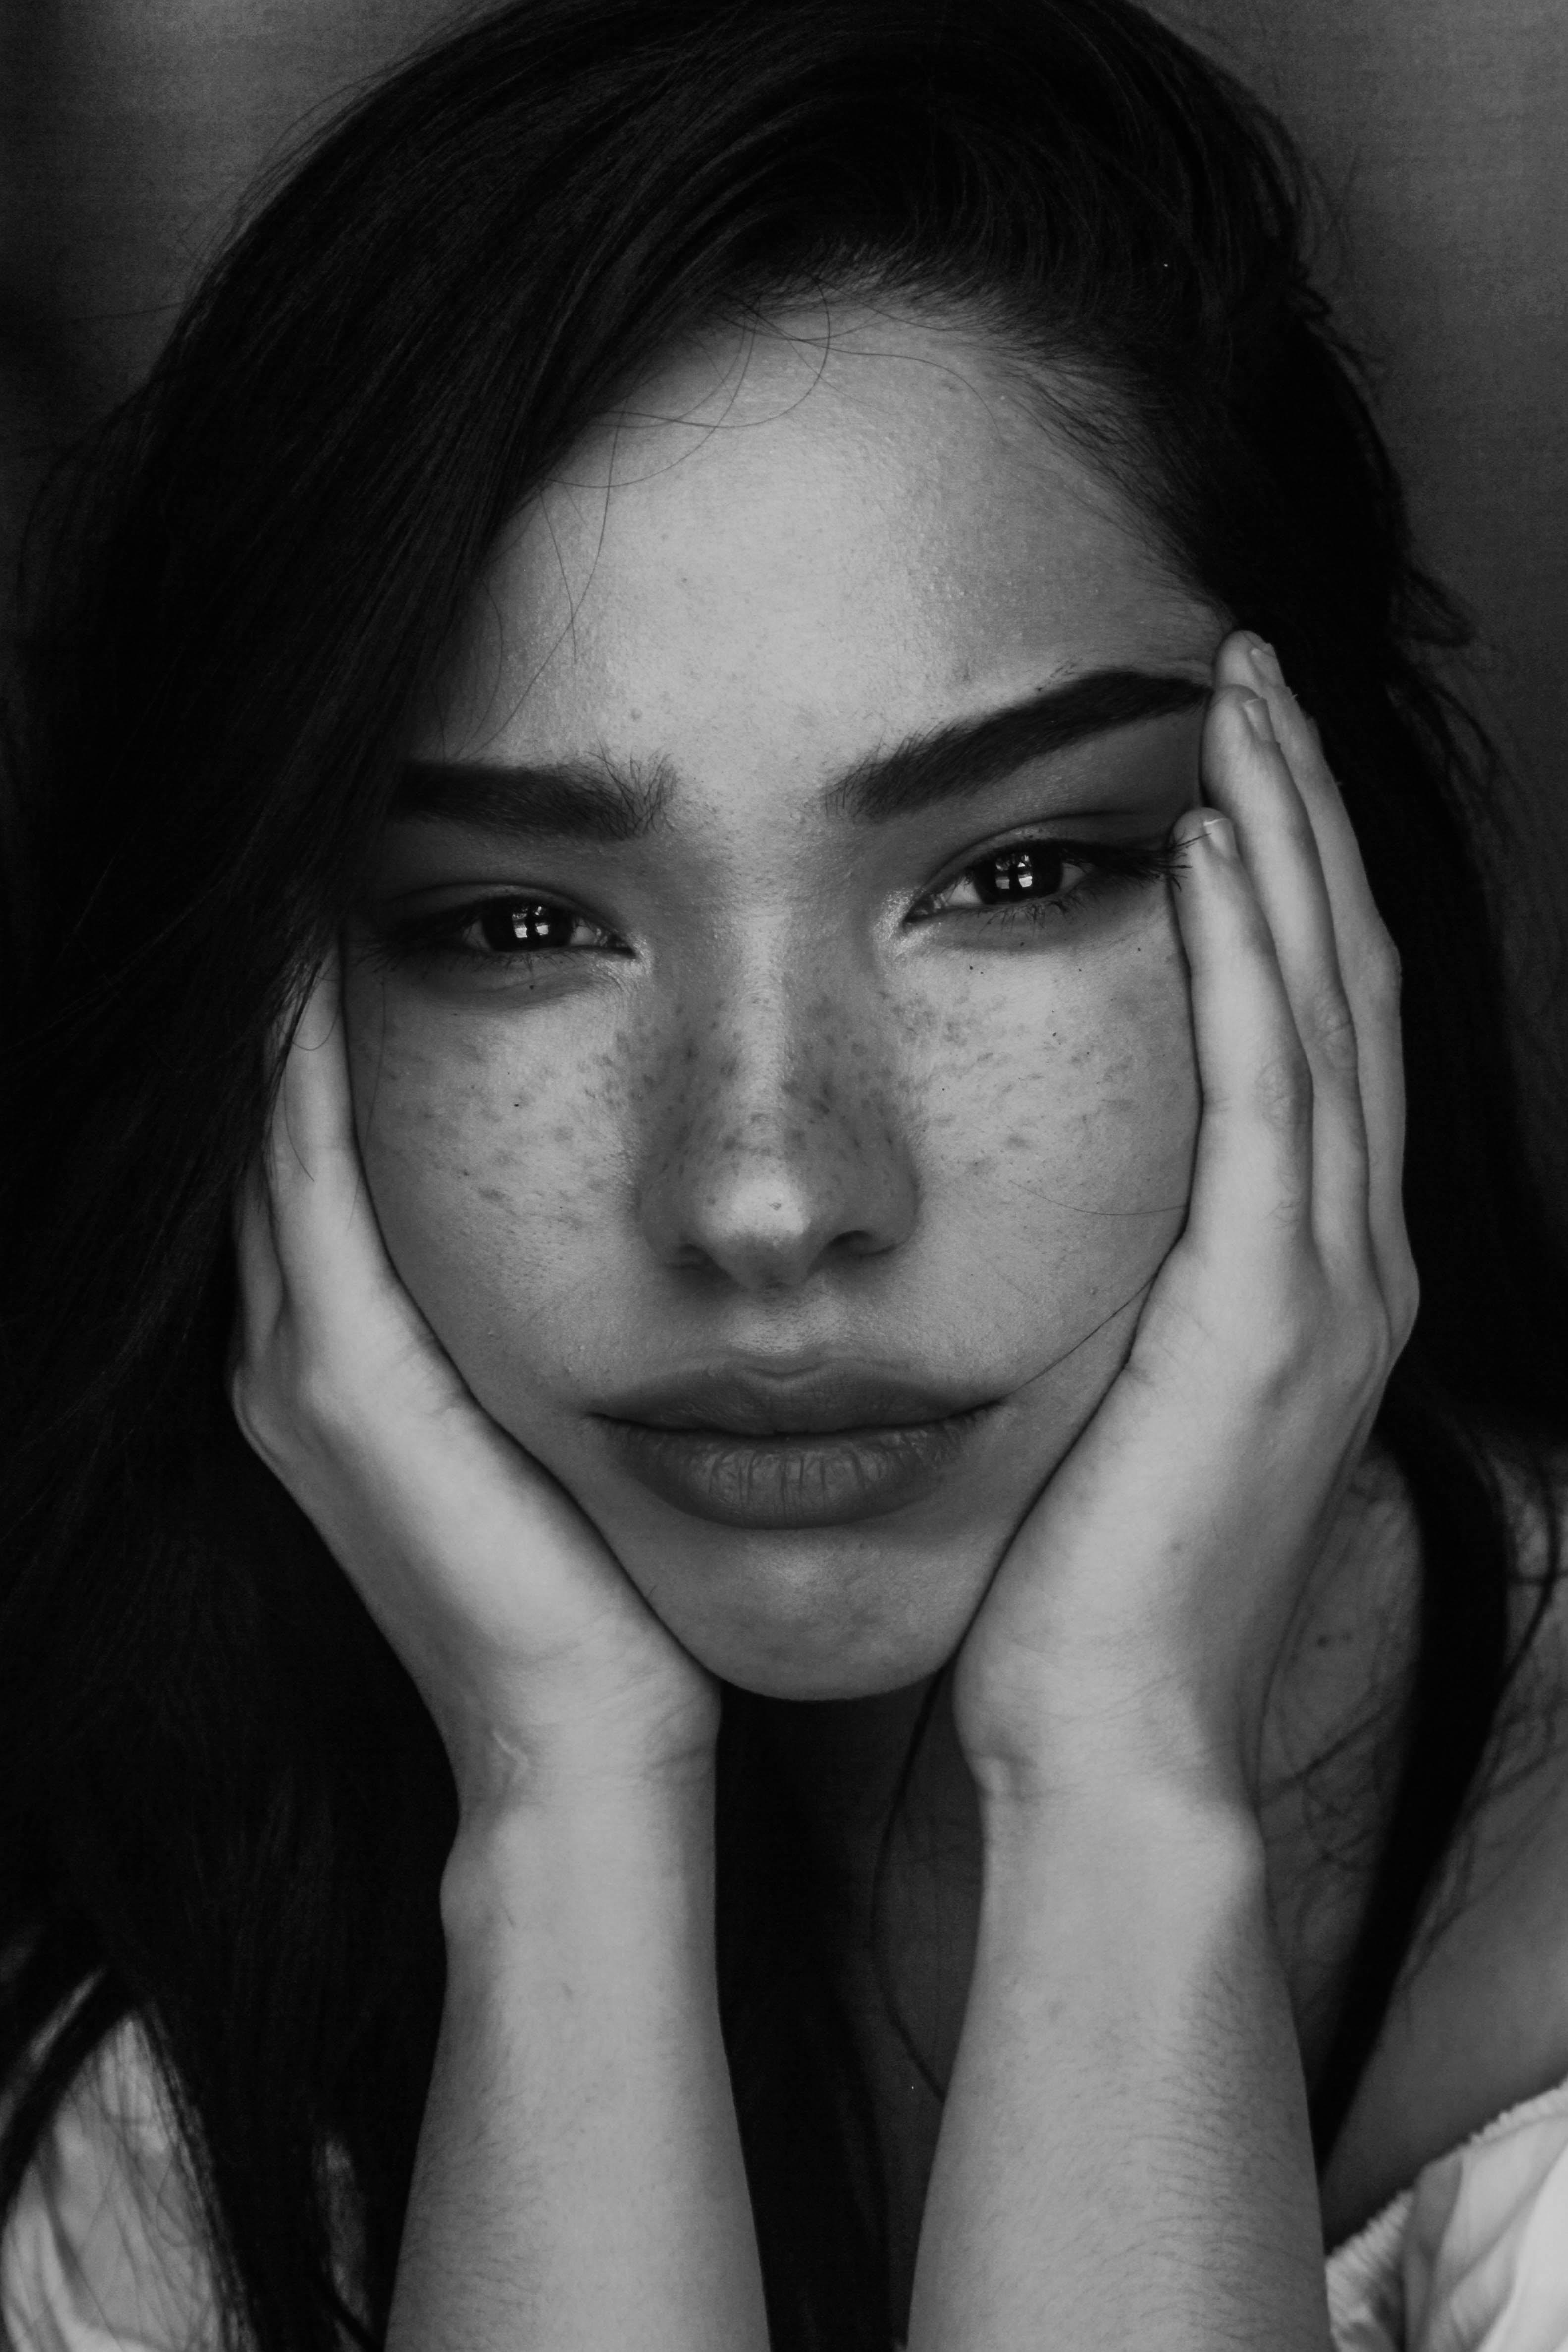 Girls in black and white pictures of Yuri Treskov 95